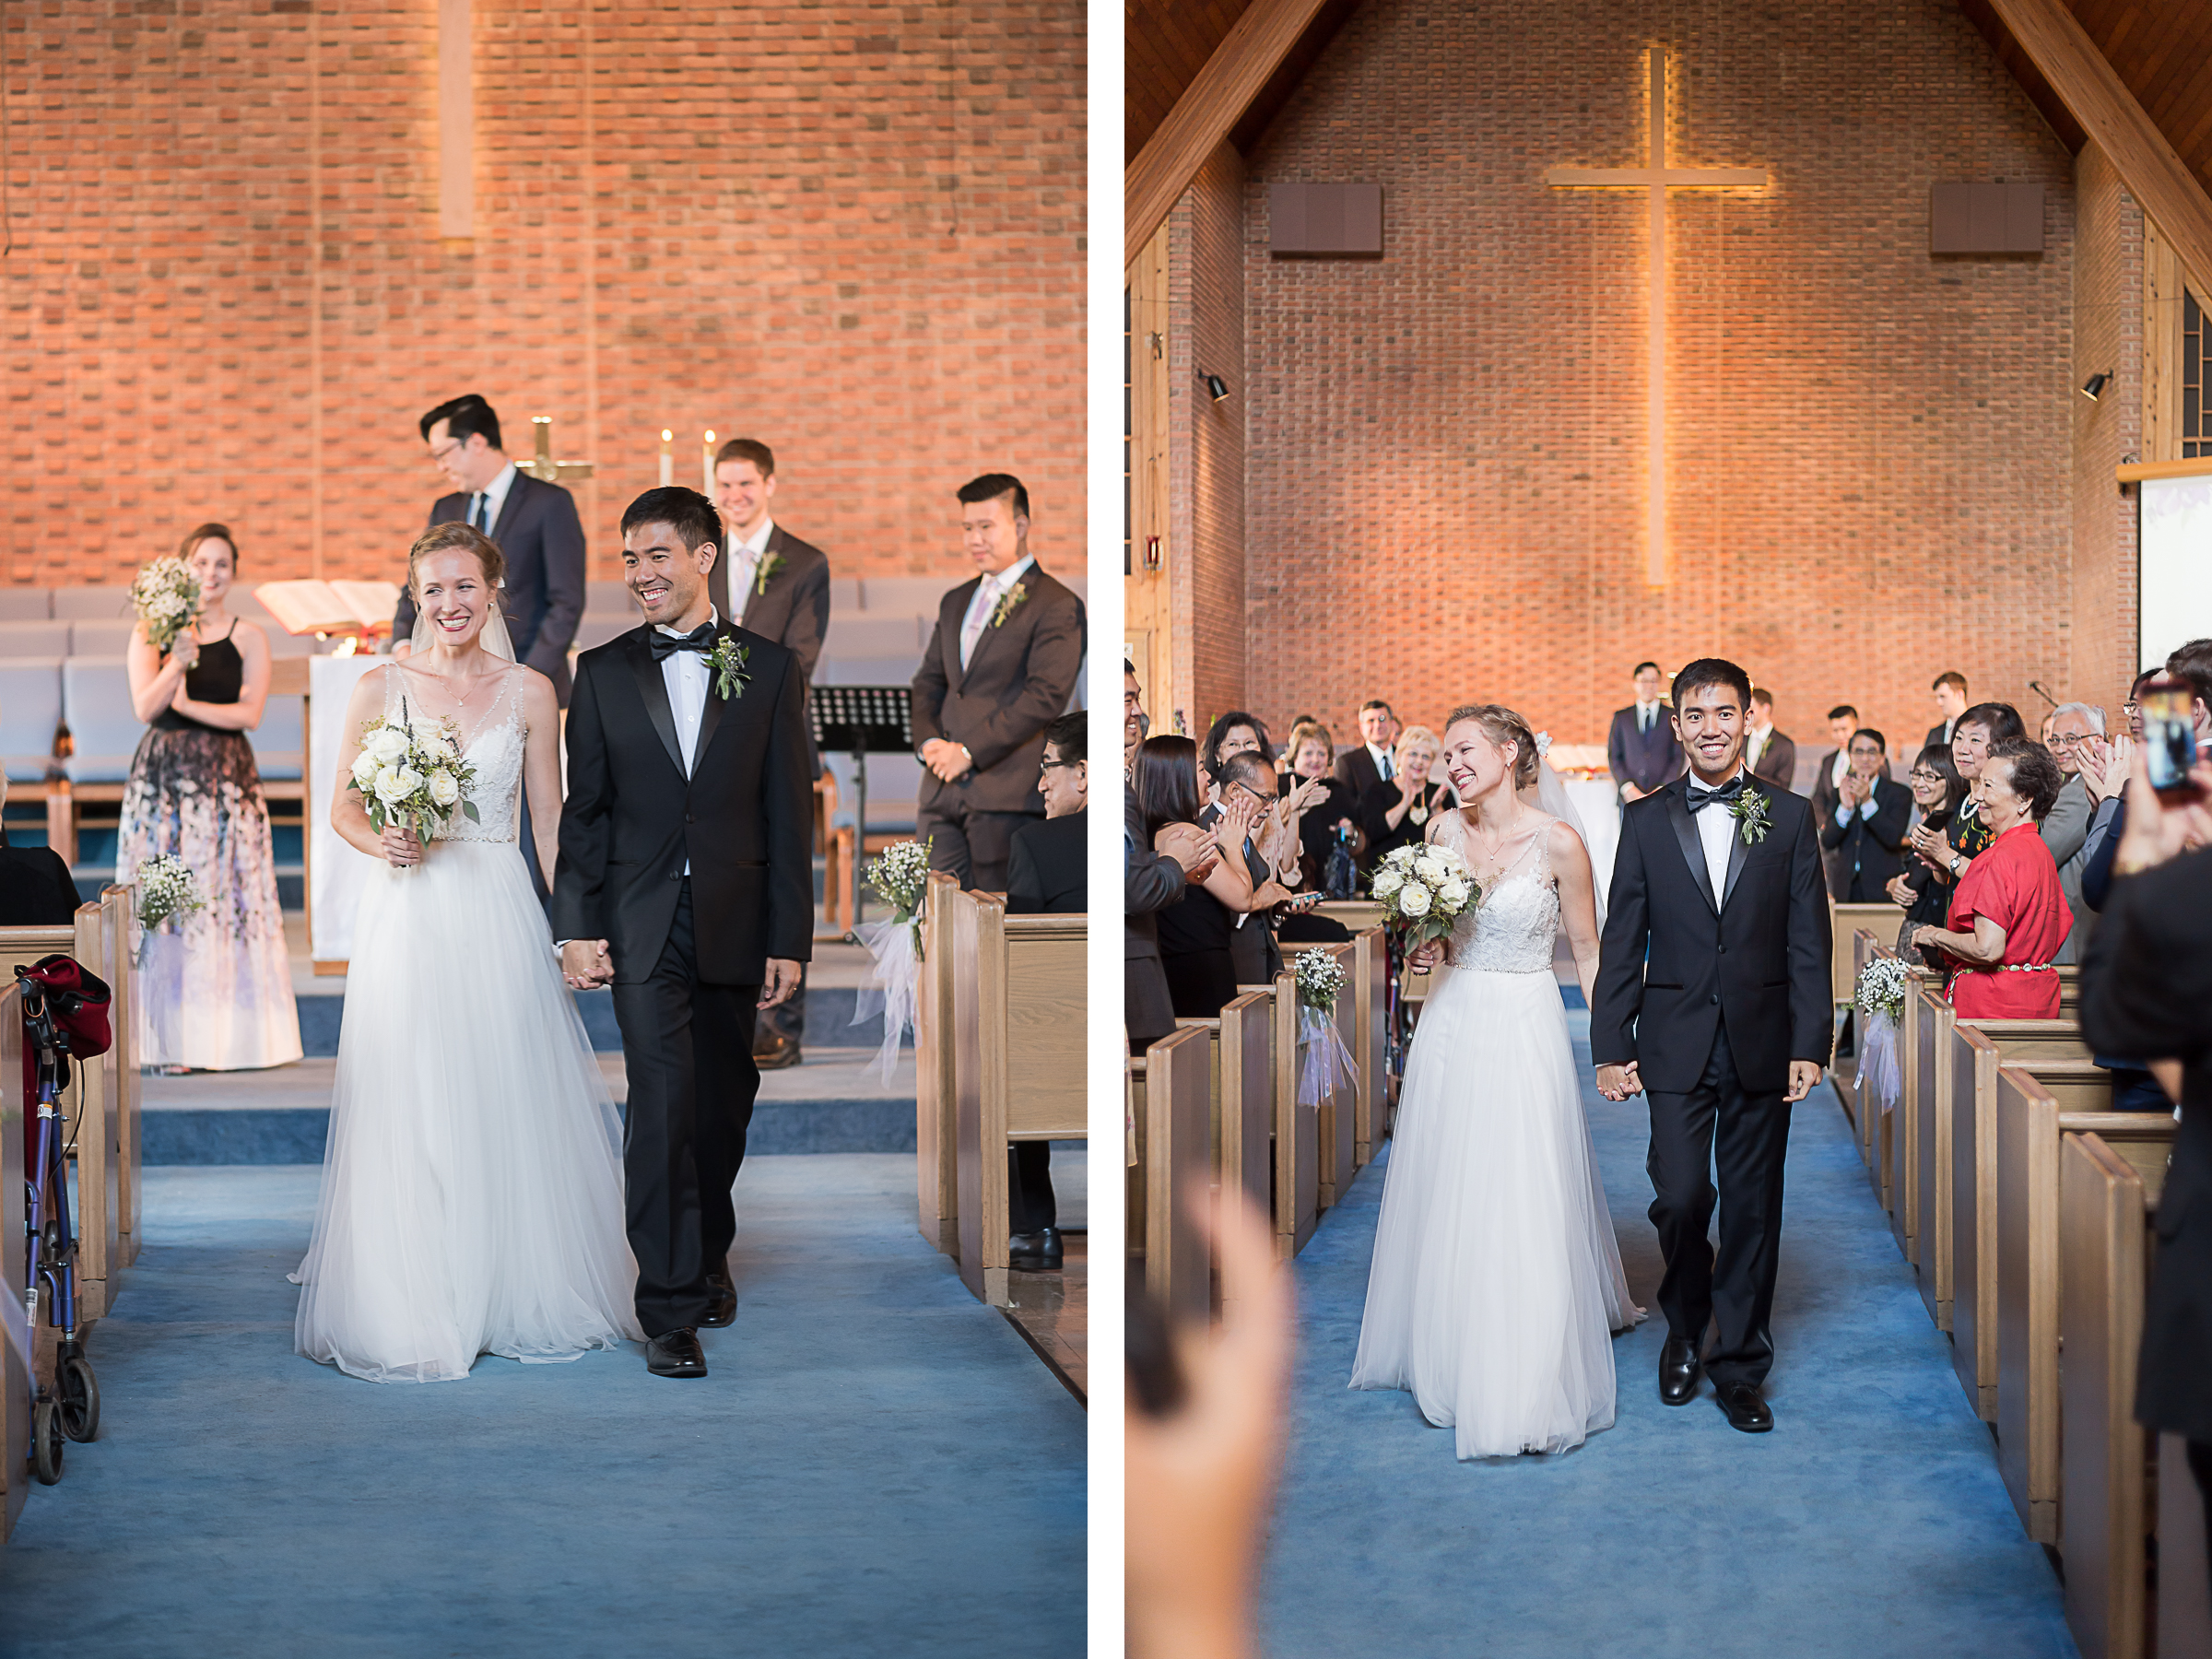 Elkridge-Furnace-Inn-Wedding-Ceremony-Bride-Groom-Recessional